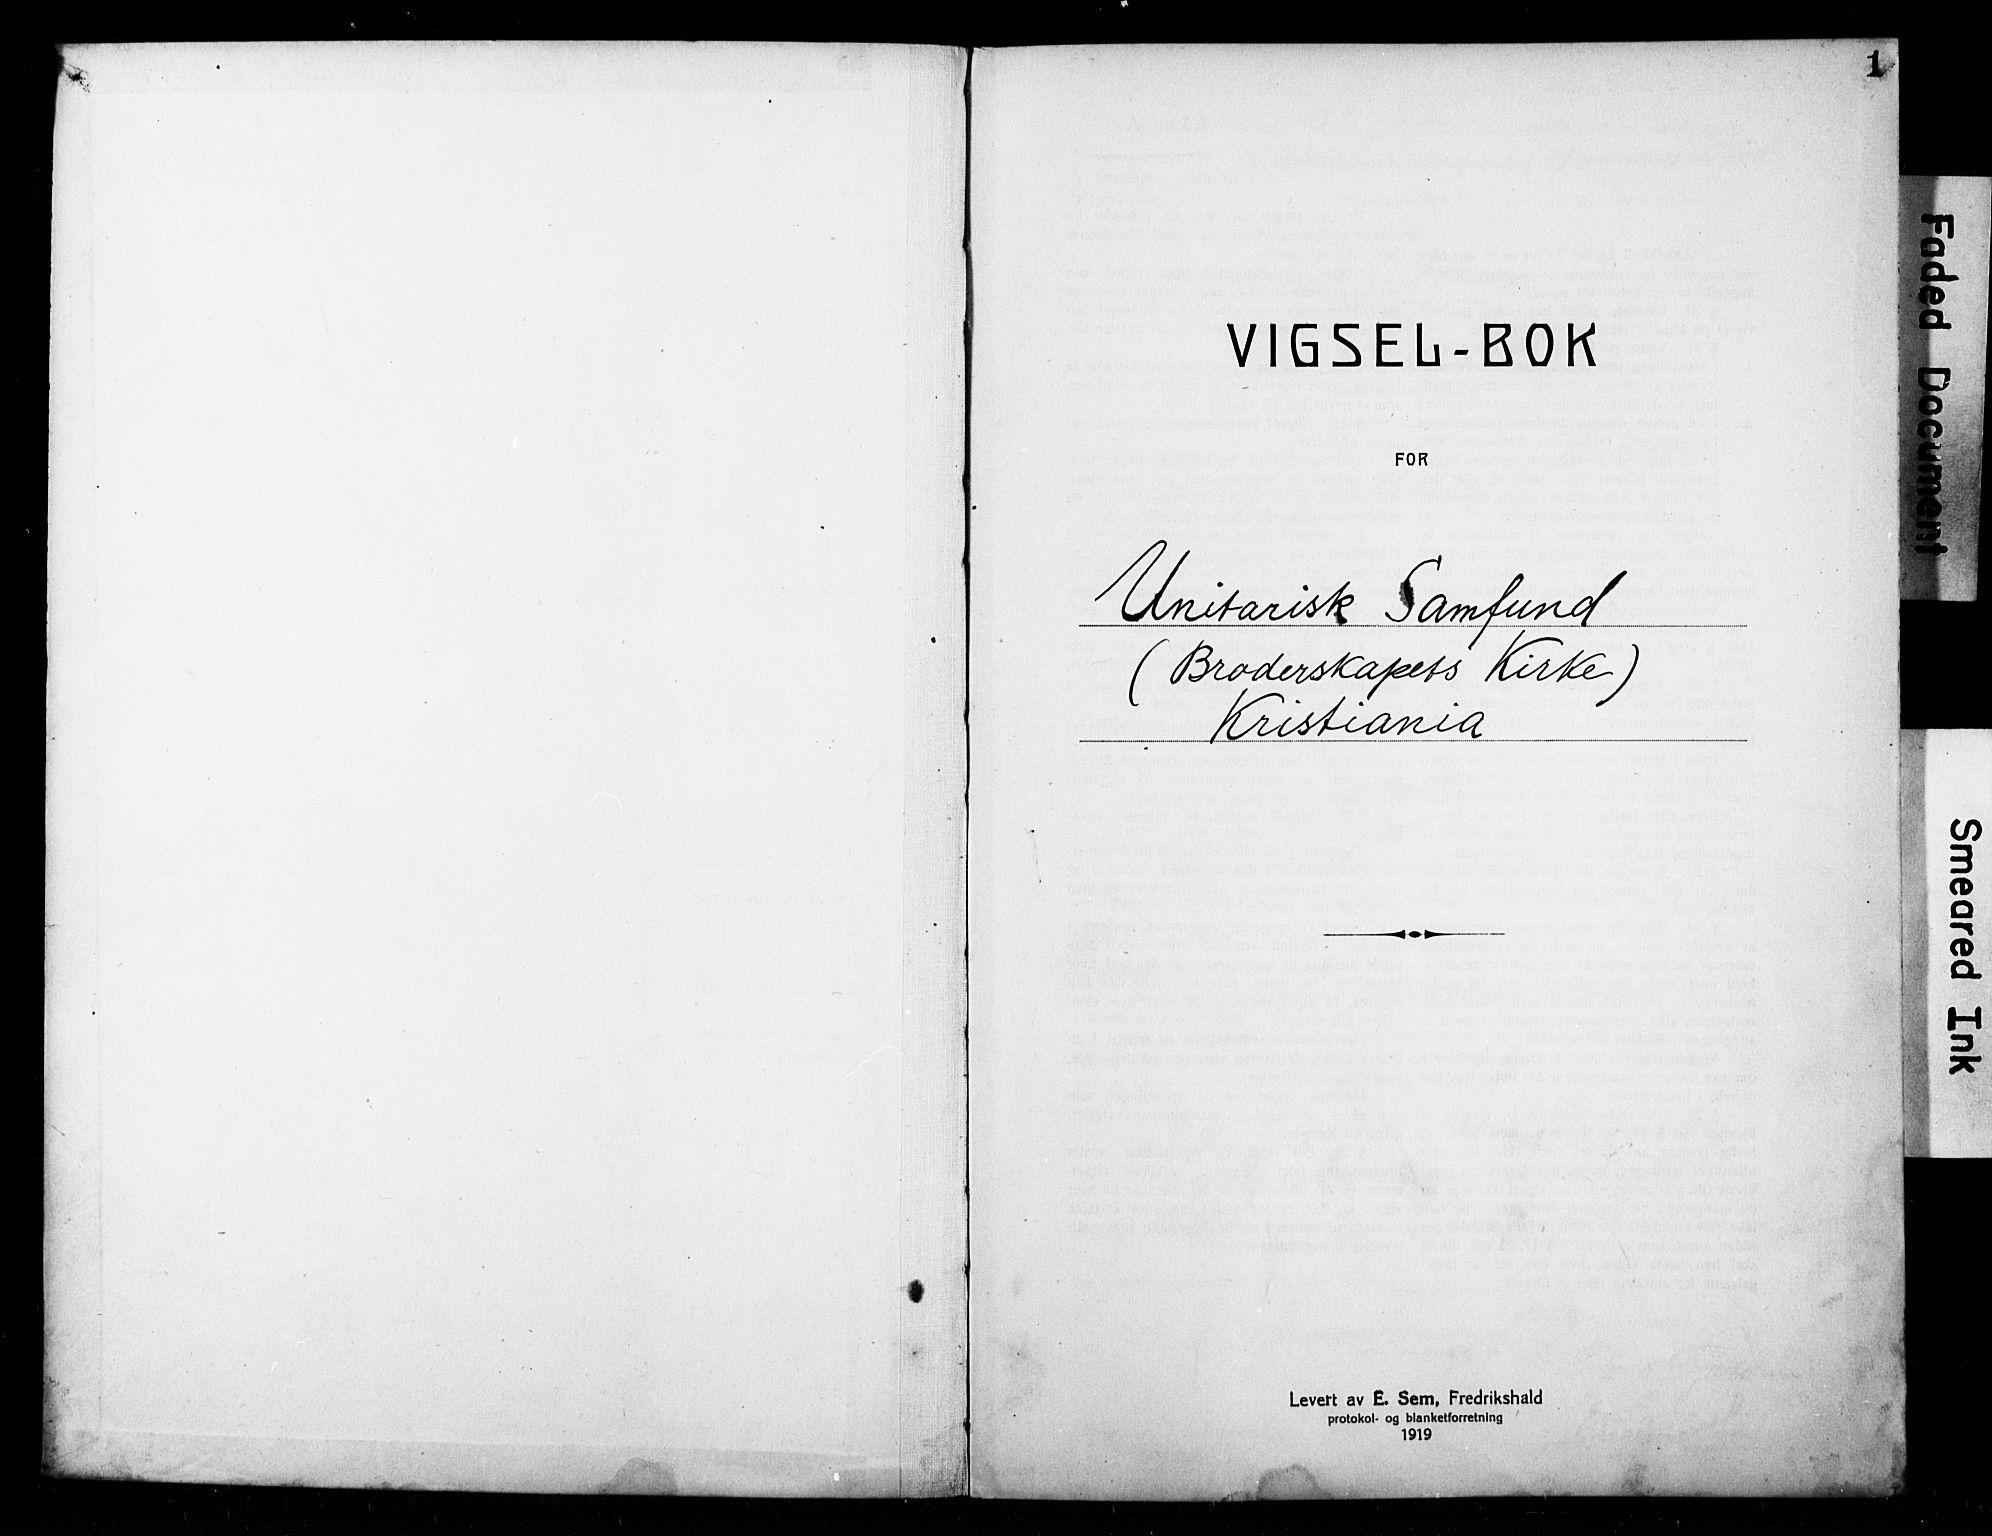 SAO, Broderskapets kirke Oslo , D/L0002: Vigselsbok (dissentere) nr. 2, 1923-1927, s. 1